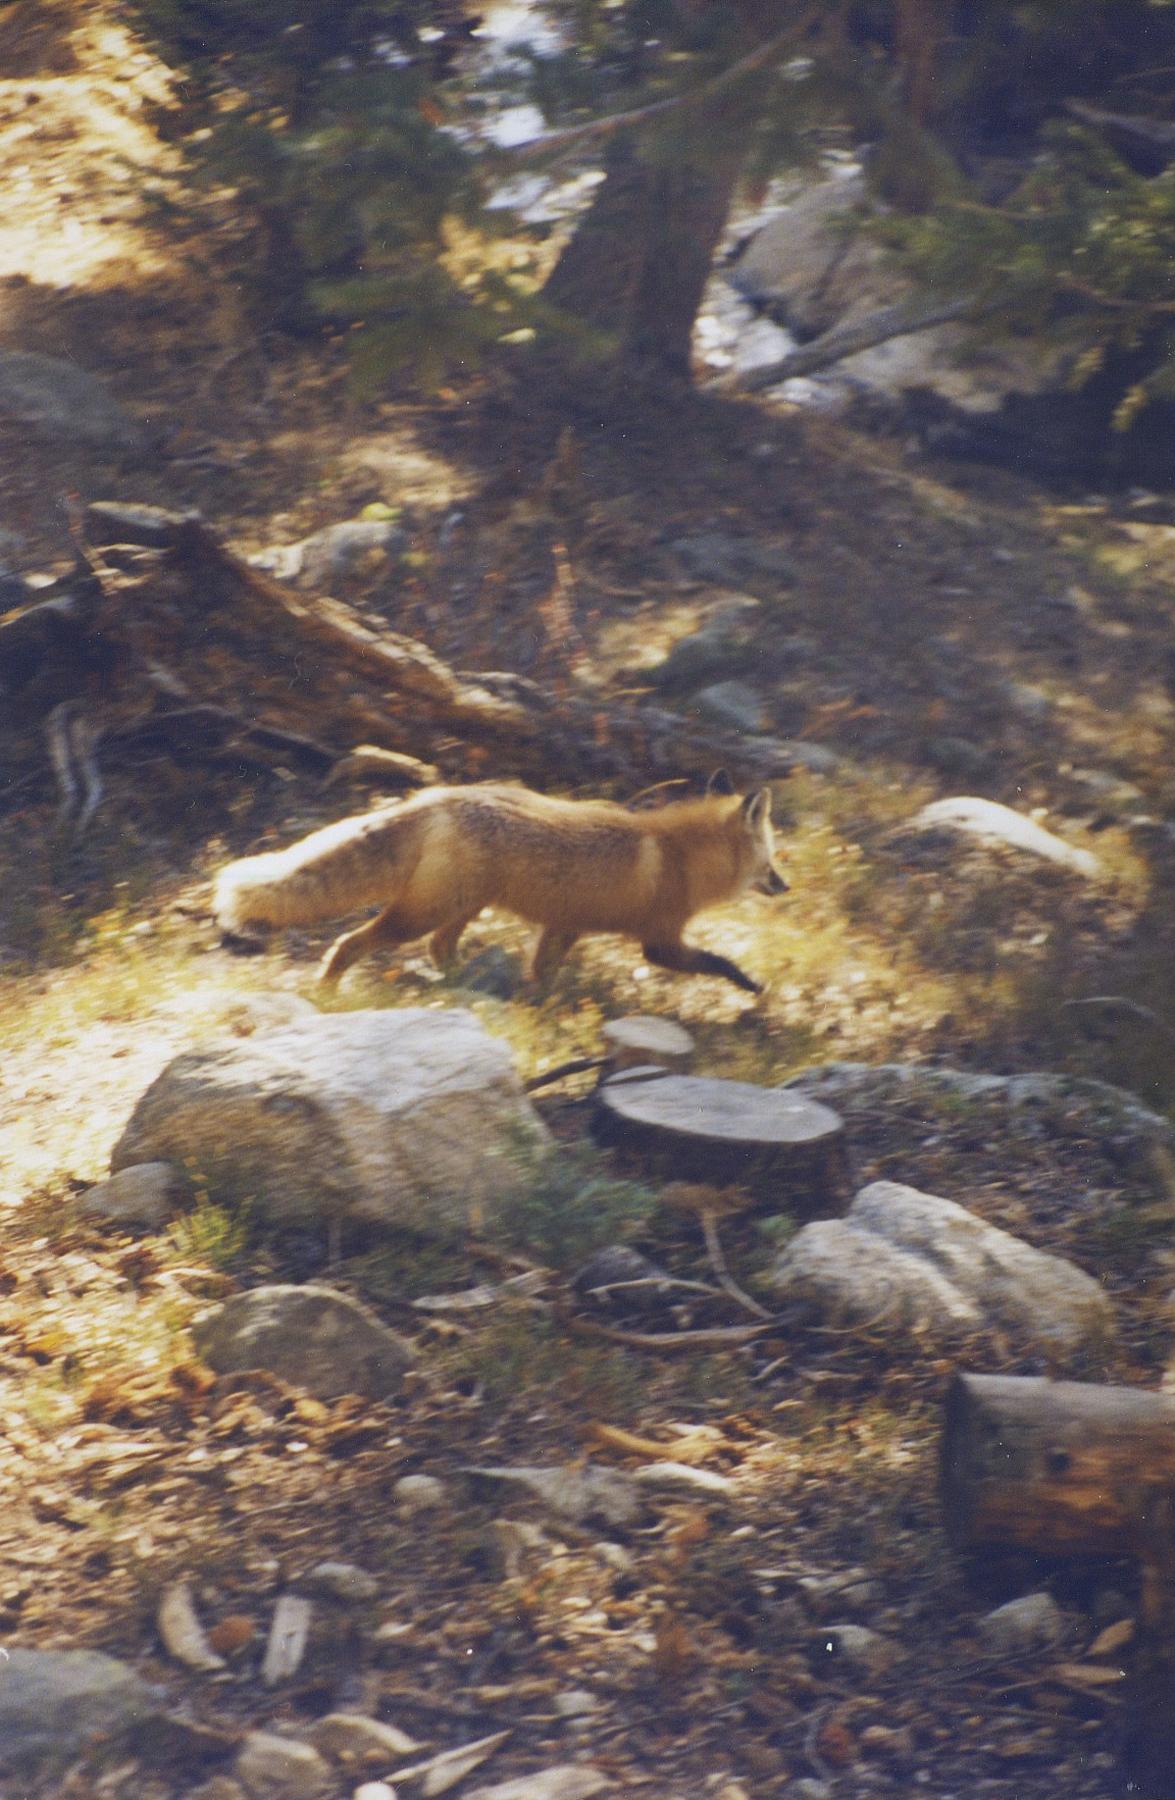 Fox walking